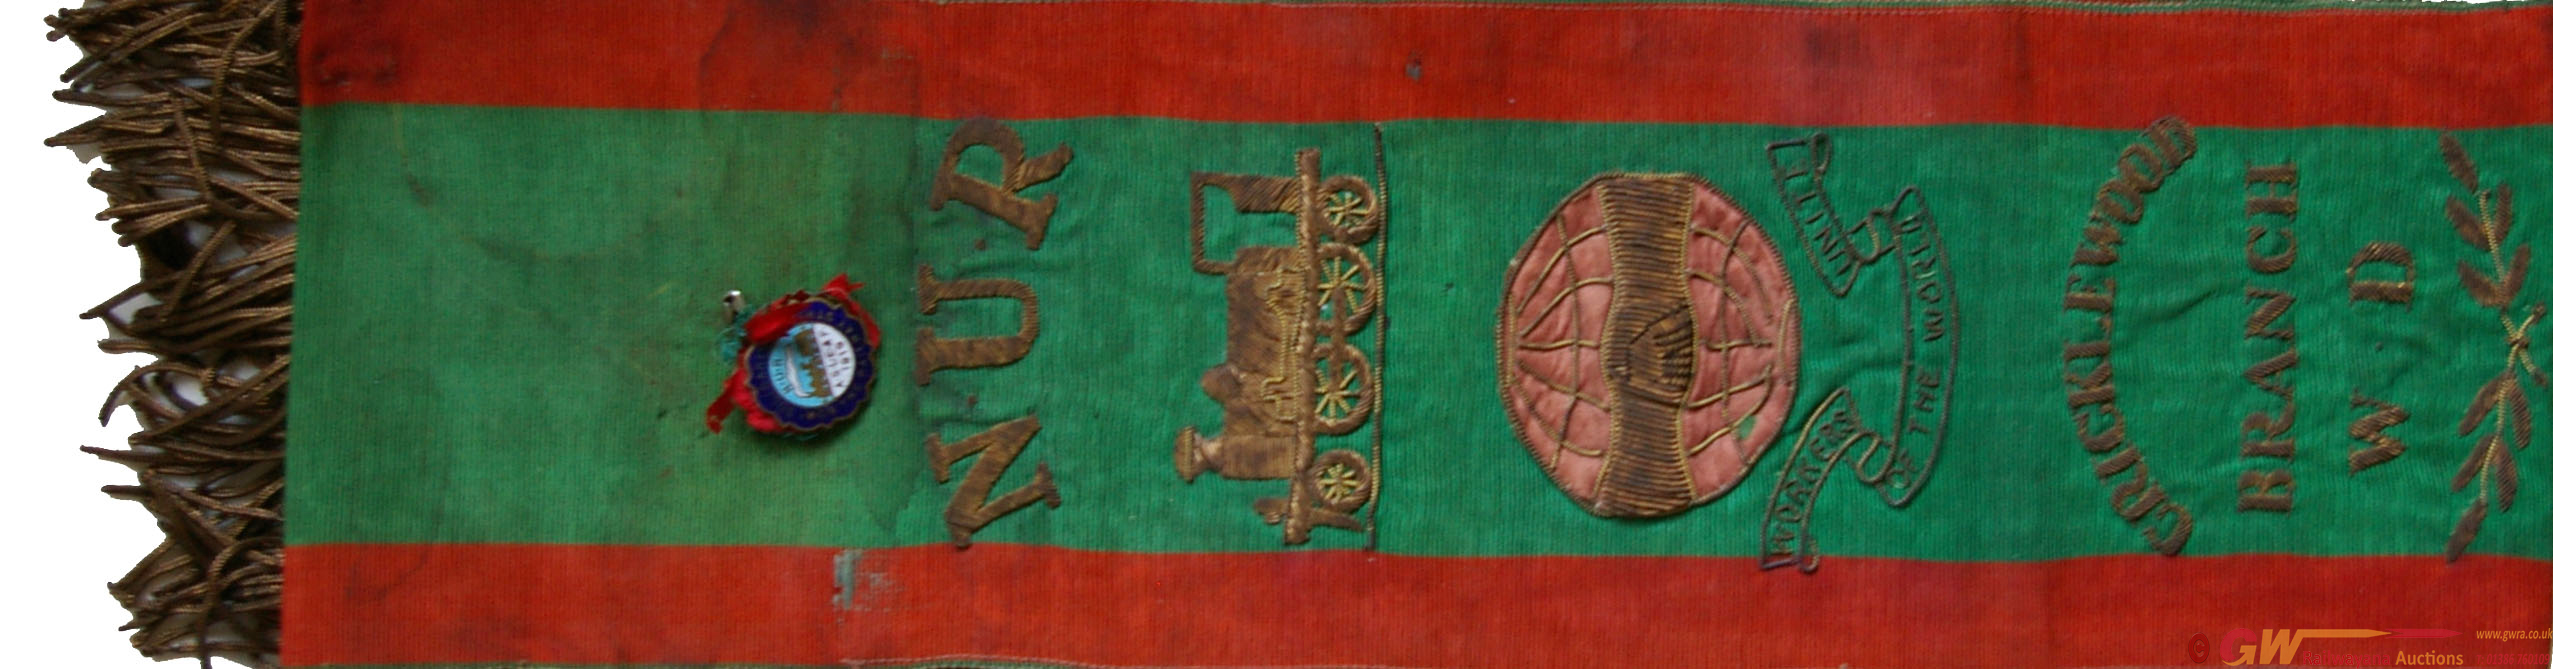 N.U.R. Railwayman's Sash In Green, Woven Textile